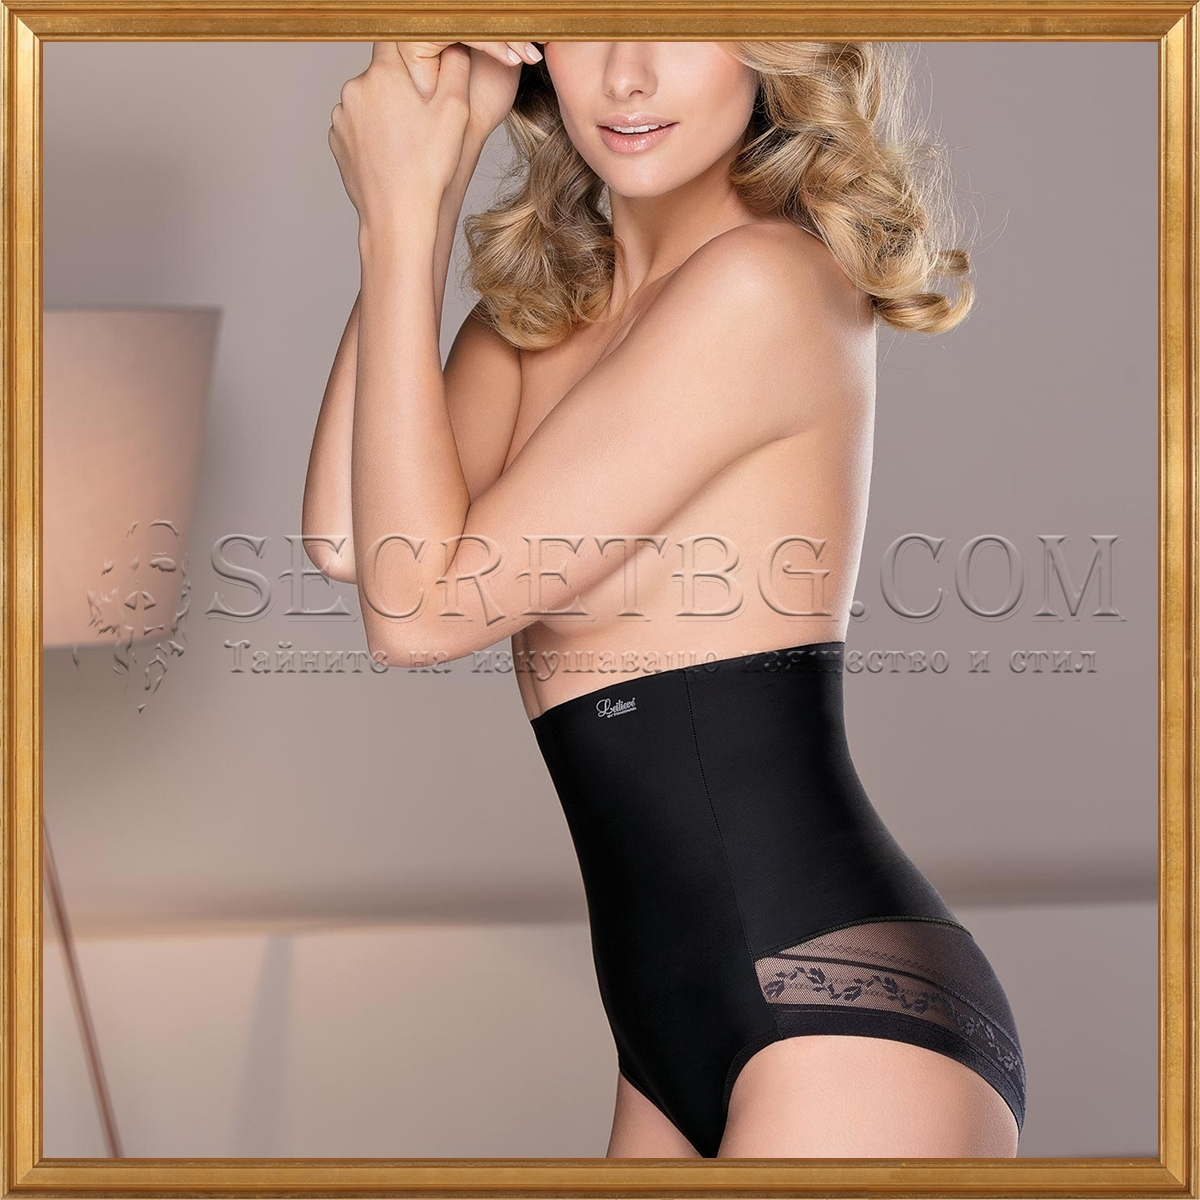 Луксозни италиански безшевни и дълбоки стягащи бикини Leilieve 4685